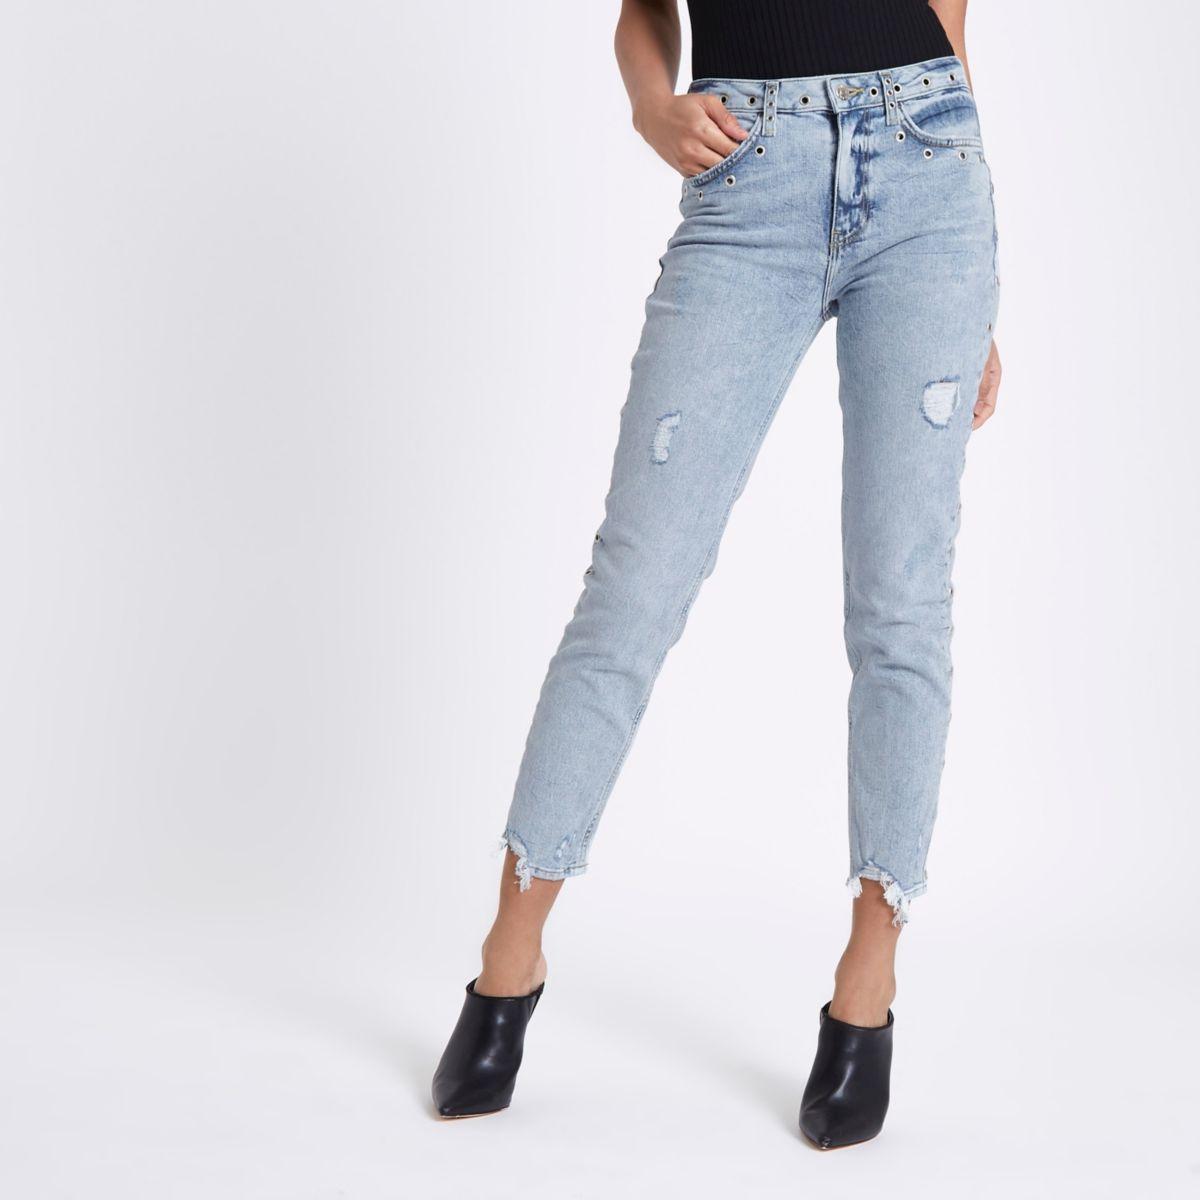 Casey - Lichtblauwe slim-fit jeans met oogjes